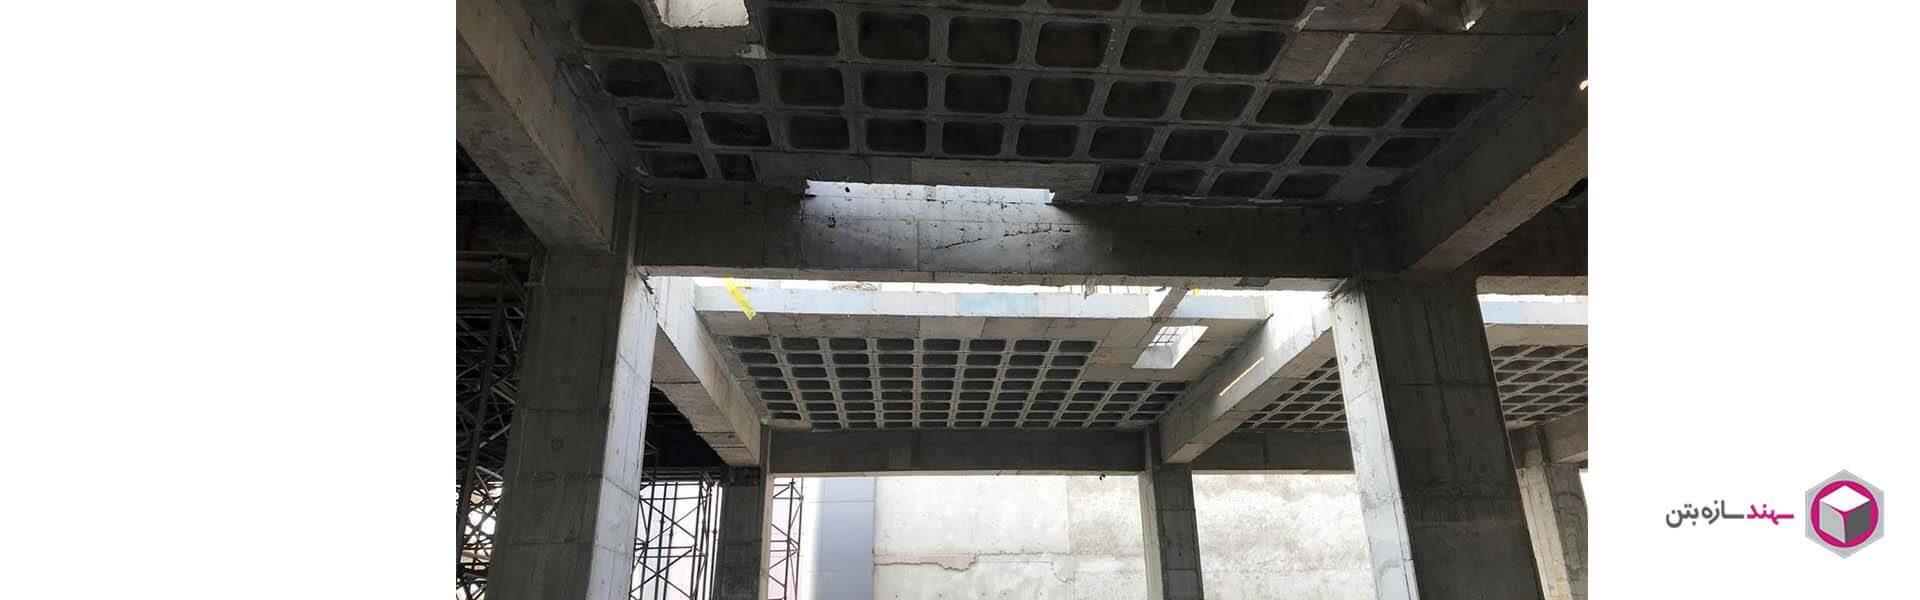 سقف وافل سهند سازه بتن